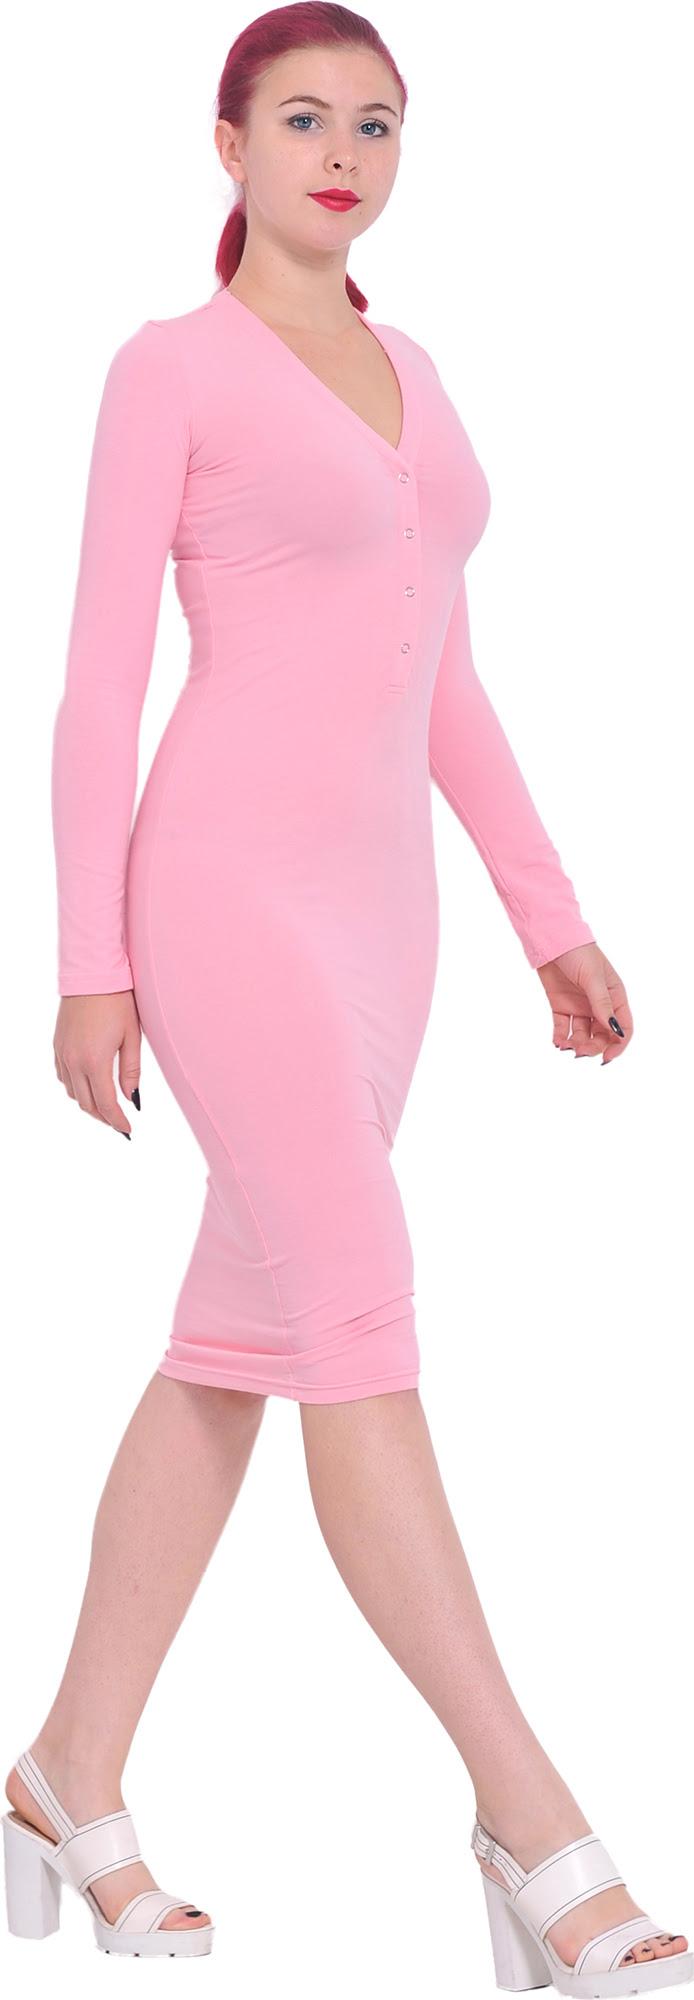 Zionsville length dress sleeve long bodycon knee